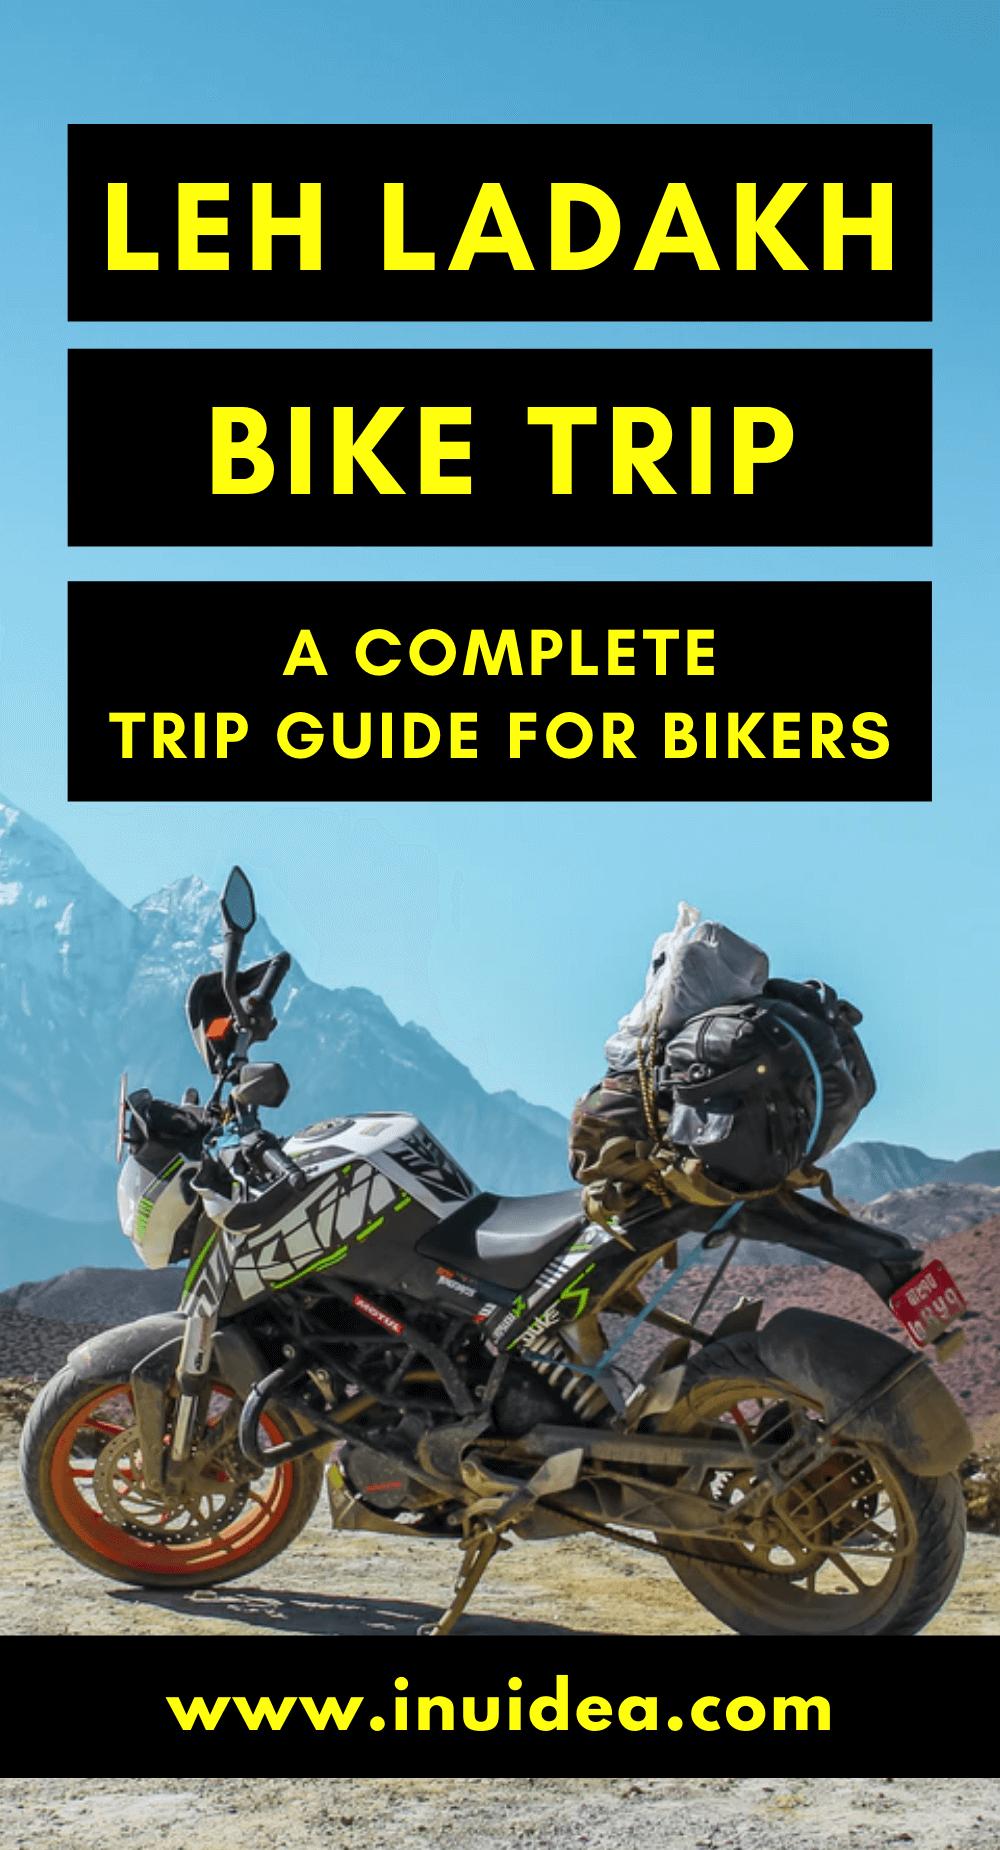 Leh Ladakh Bike Trip - A complete Trip Guide for Bikers